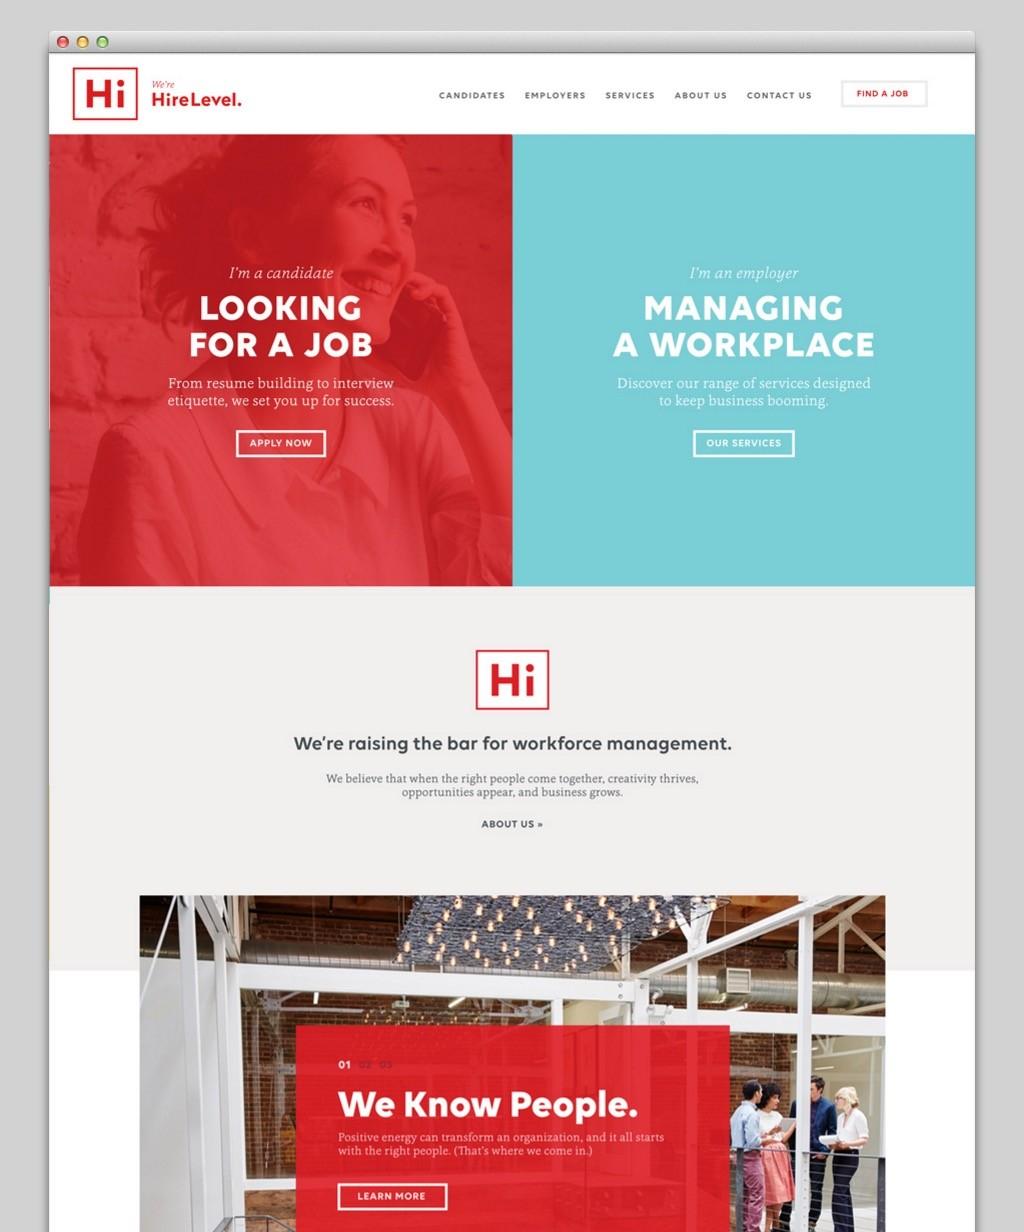 Split dichotomies - 2017 web design trend style